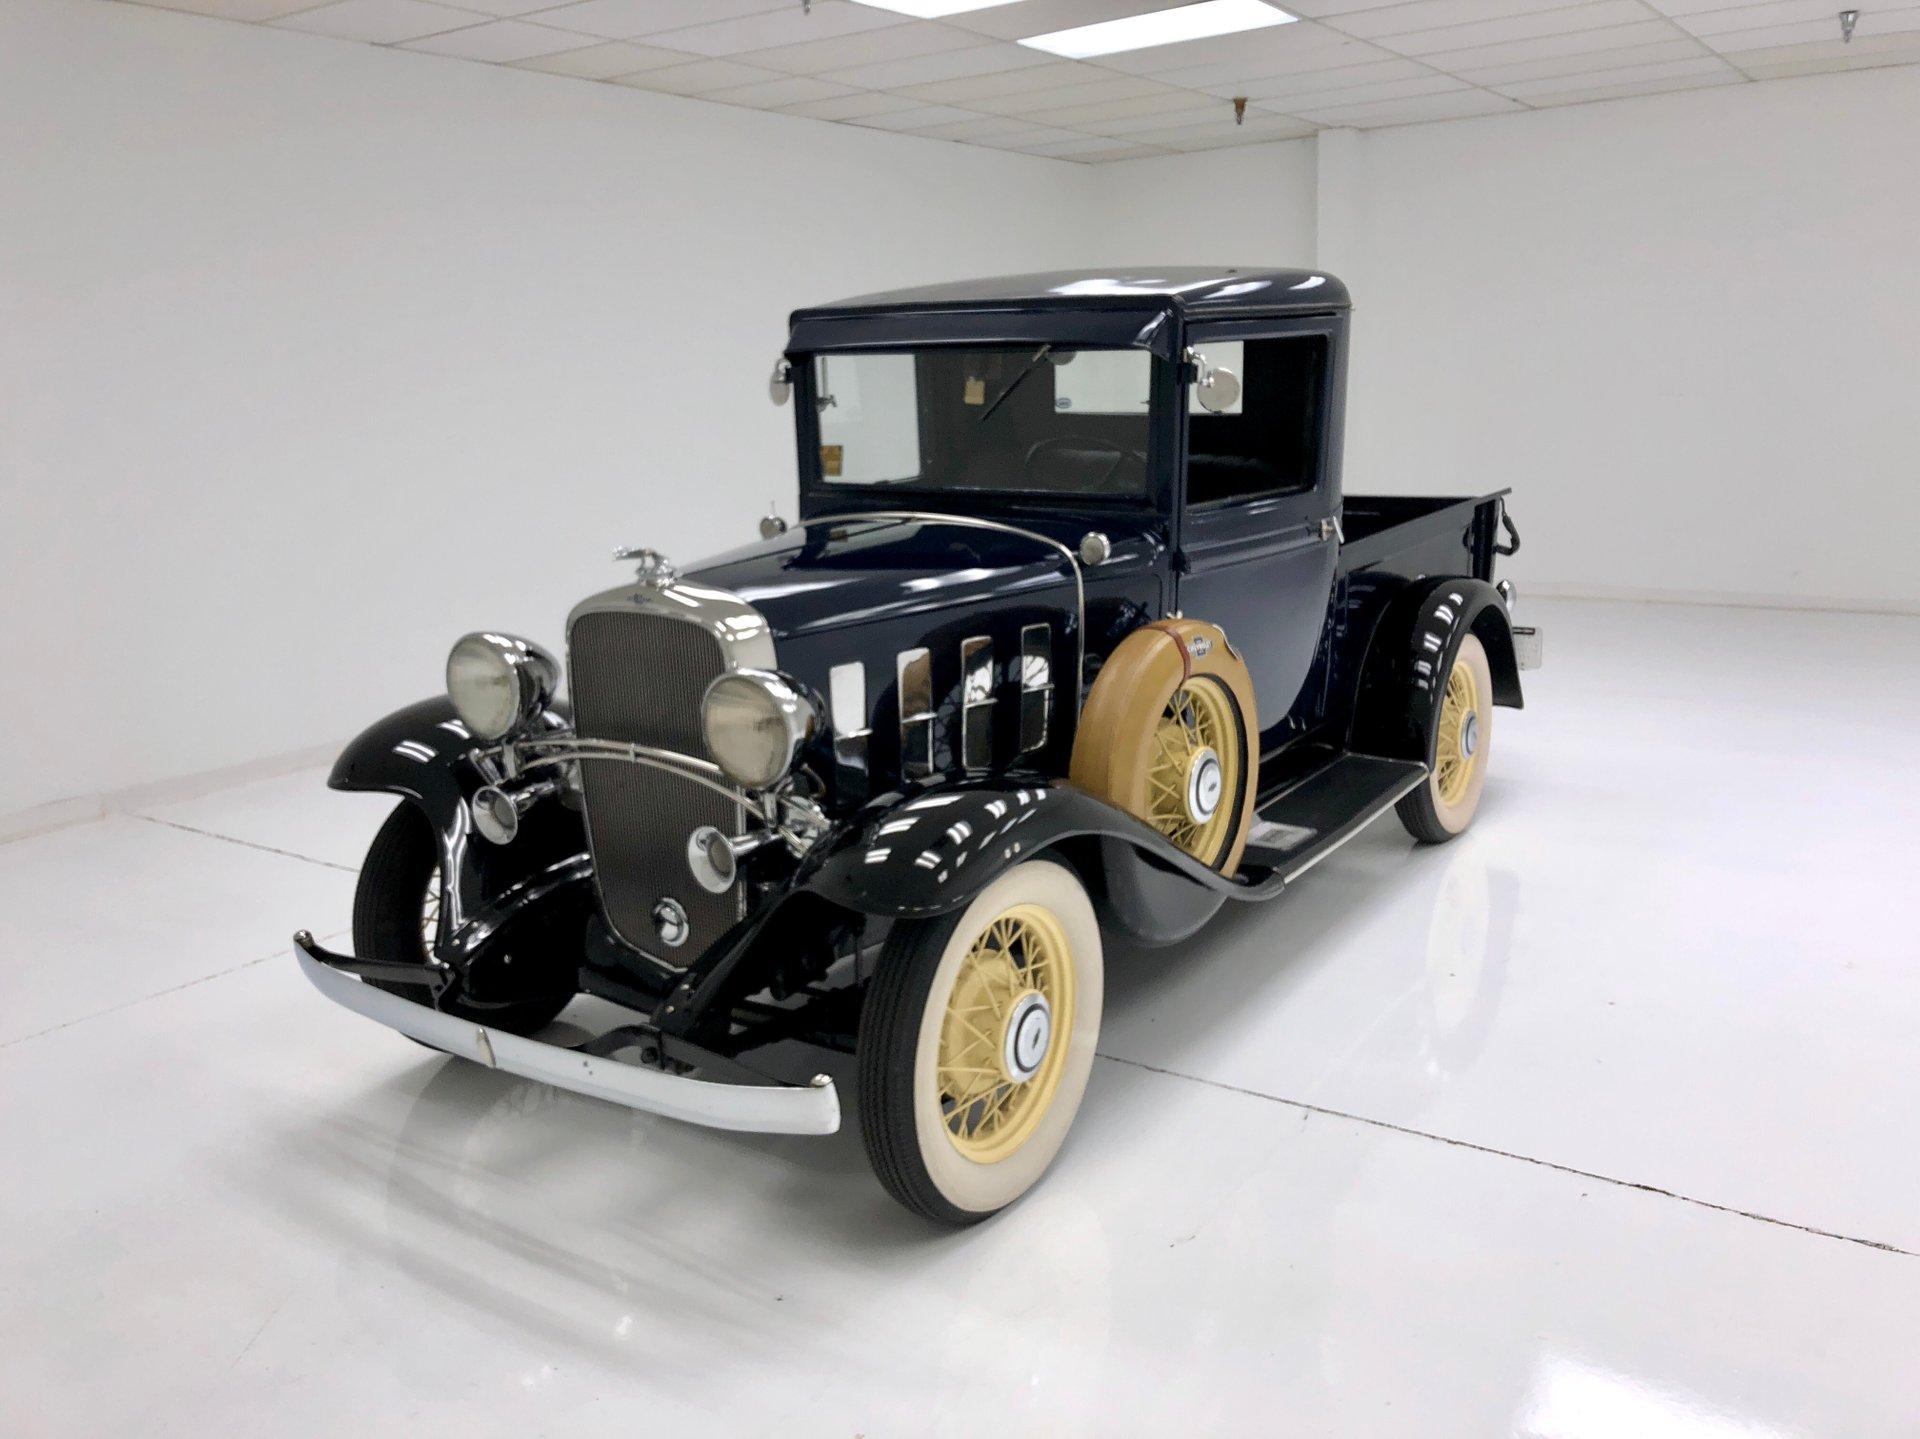 1932 Chevrolet Pickup